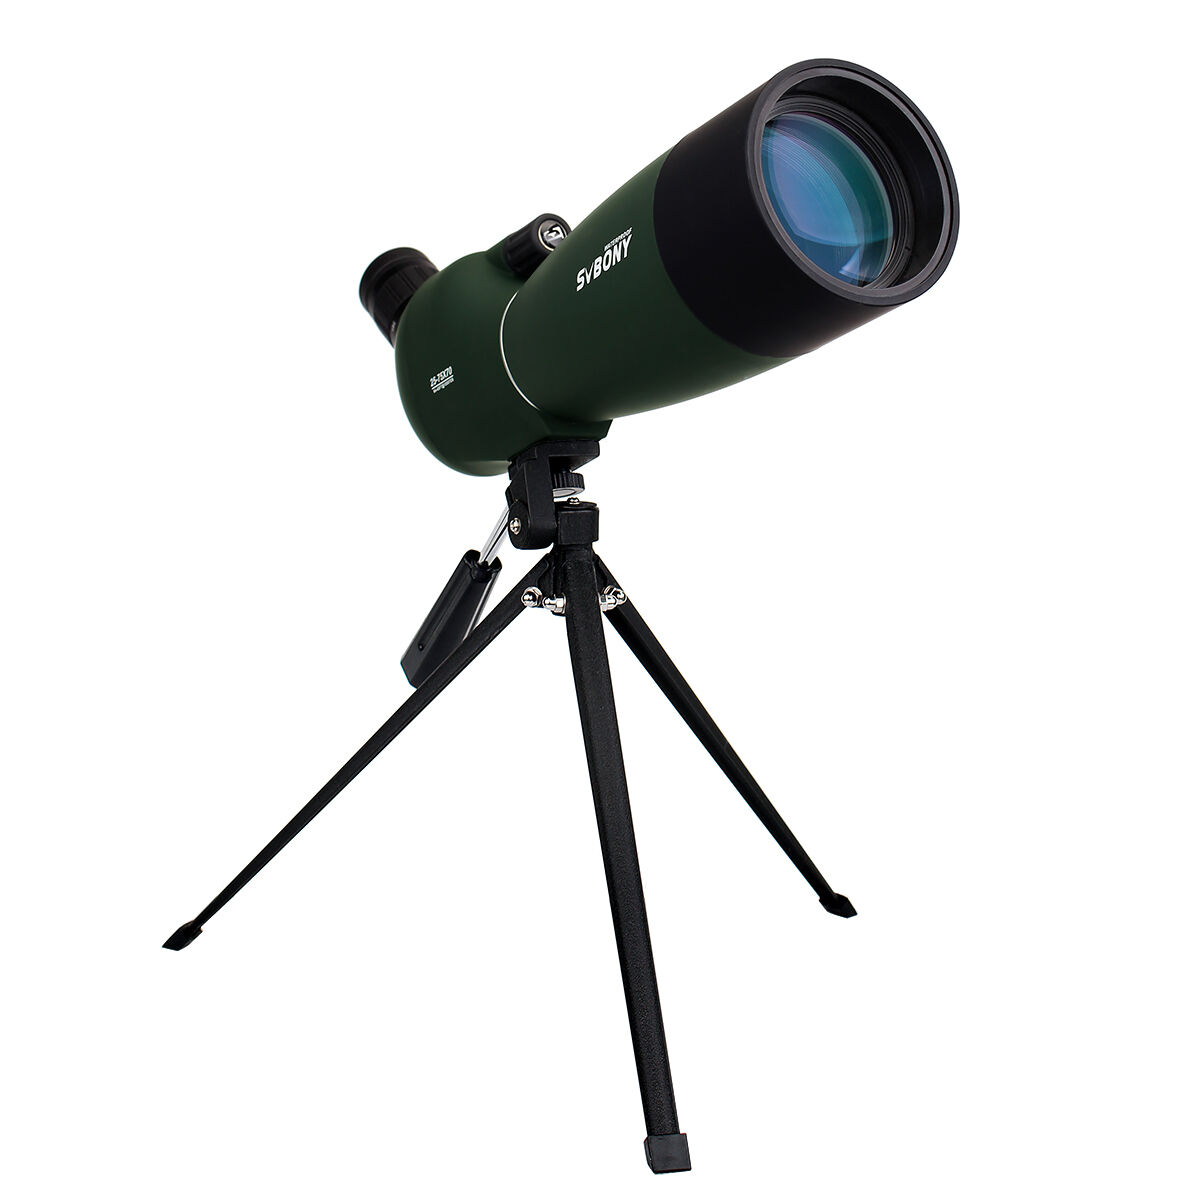 Svbony SV28 25-75x70mm Telescopio Terrestre Zoom Angular Impermeable Funda + Trípode